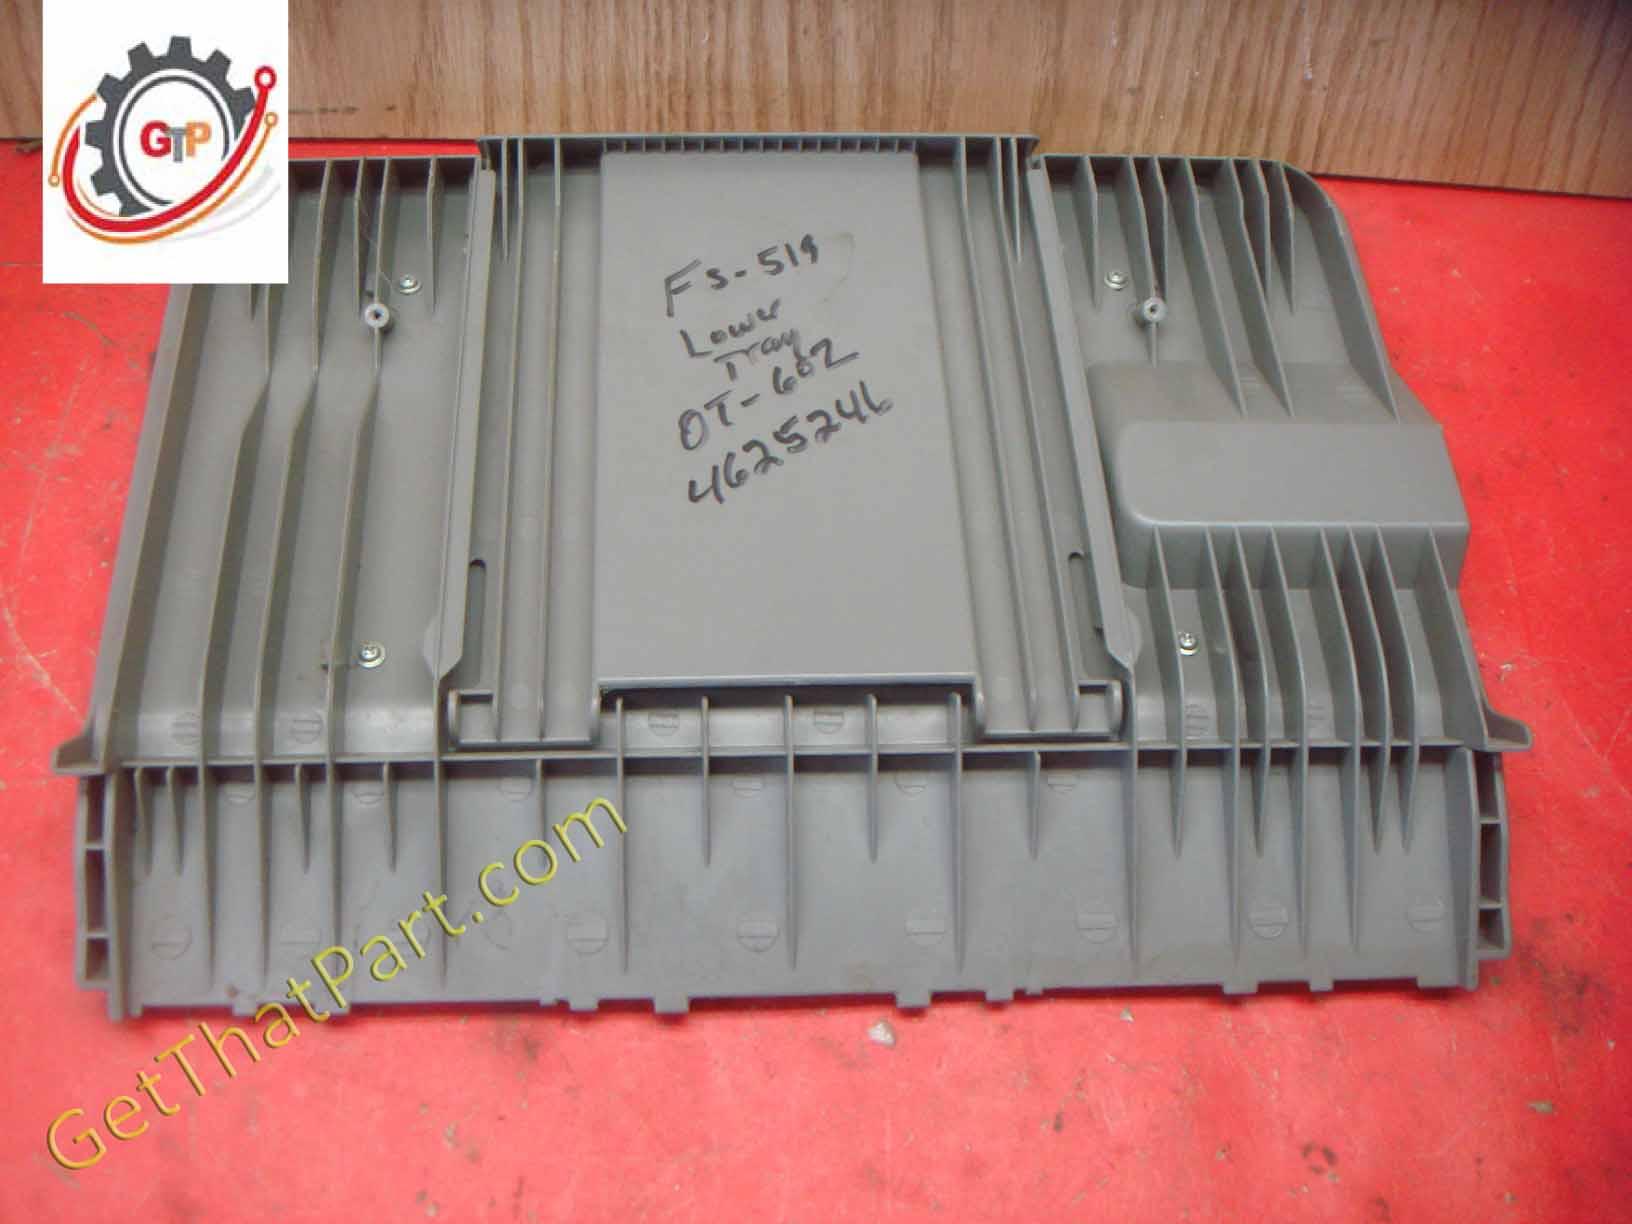 Konica Minolta FS519 Output Tray OT-602